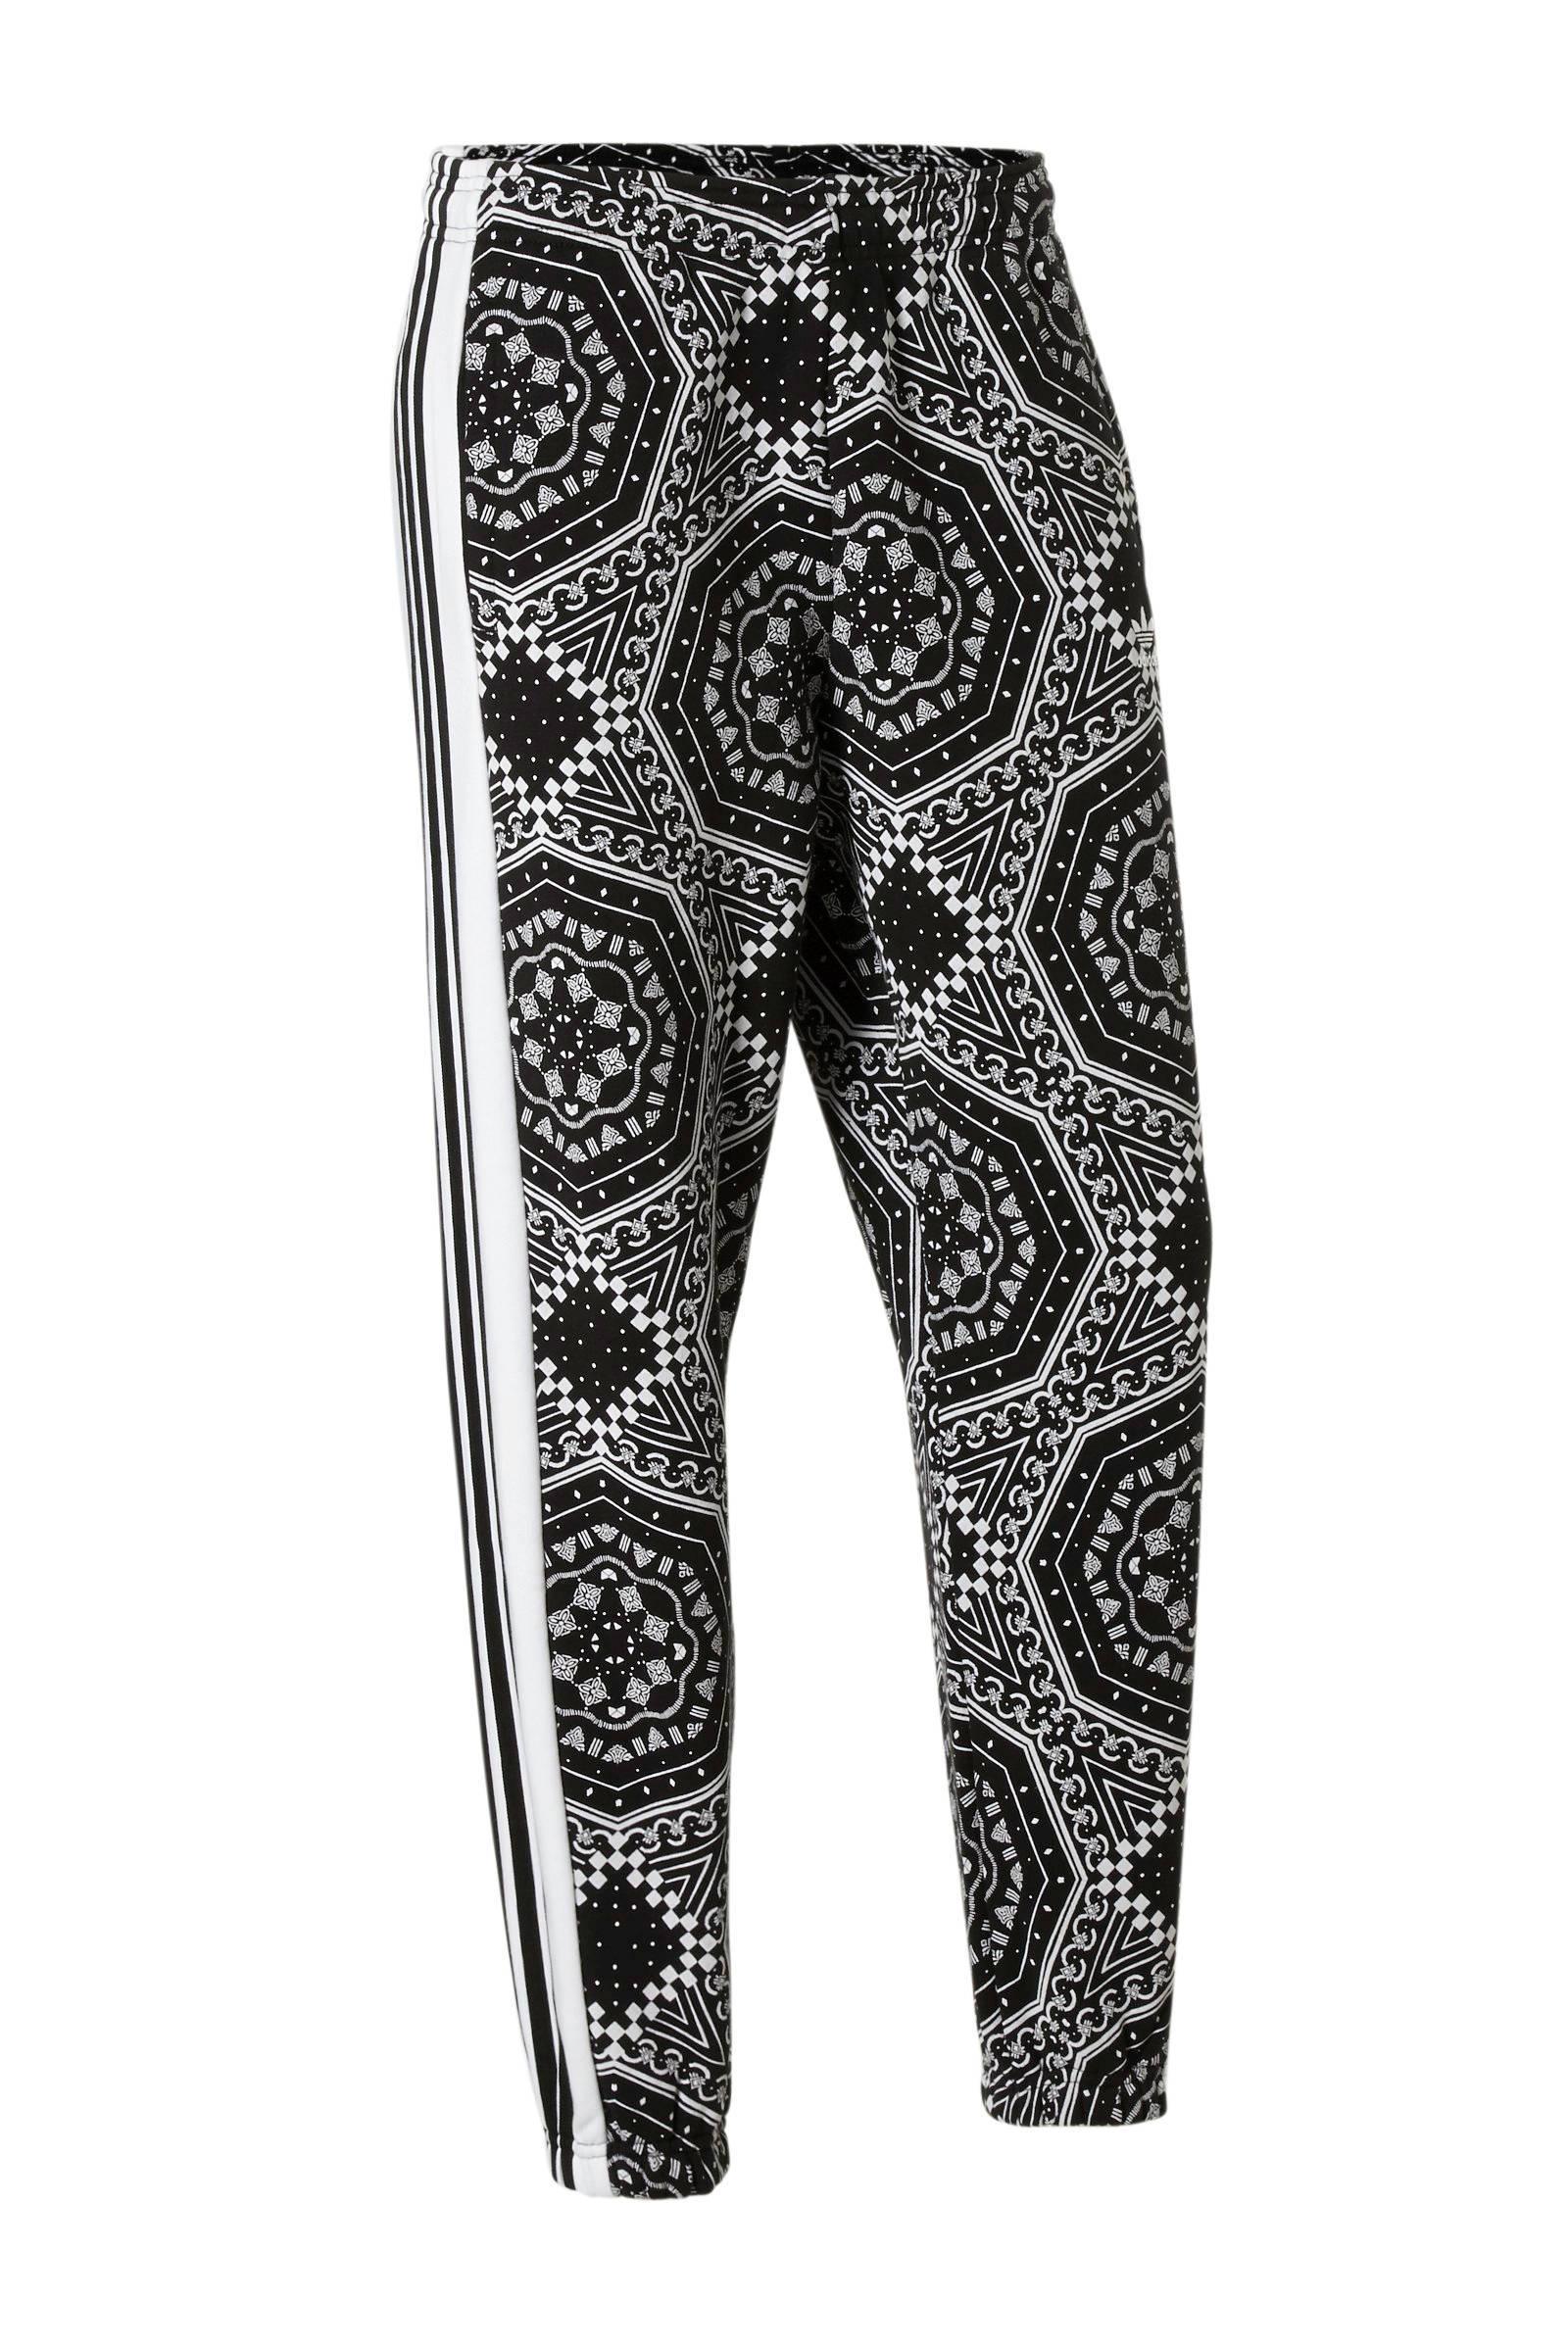 987ab7f8828 adidas originals joggingbroek zwart/wit   wehkamp